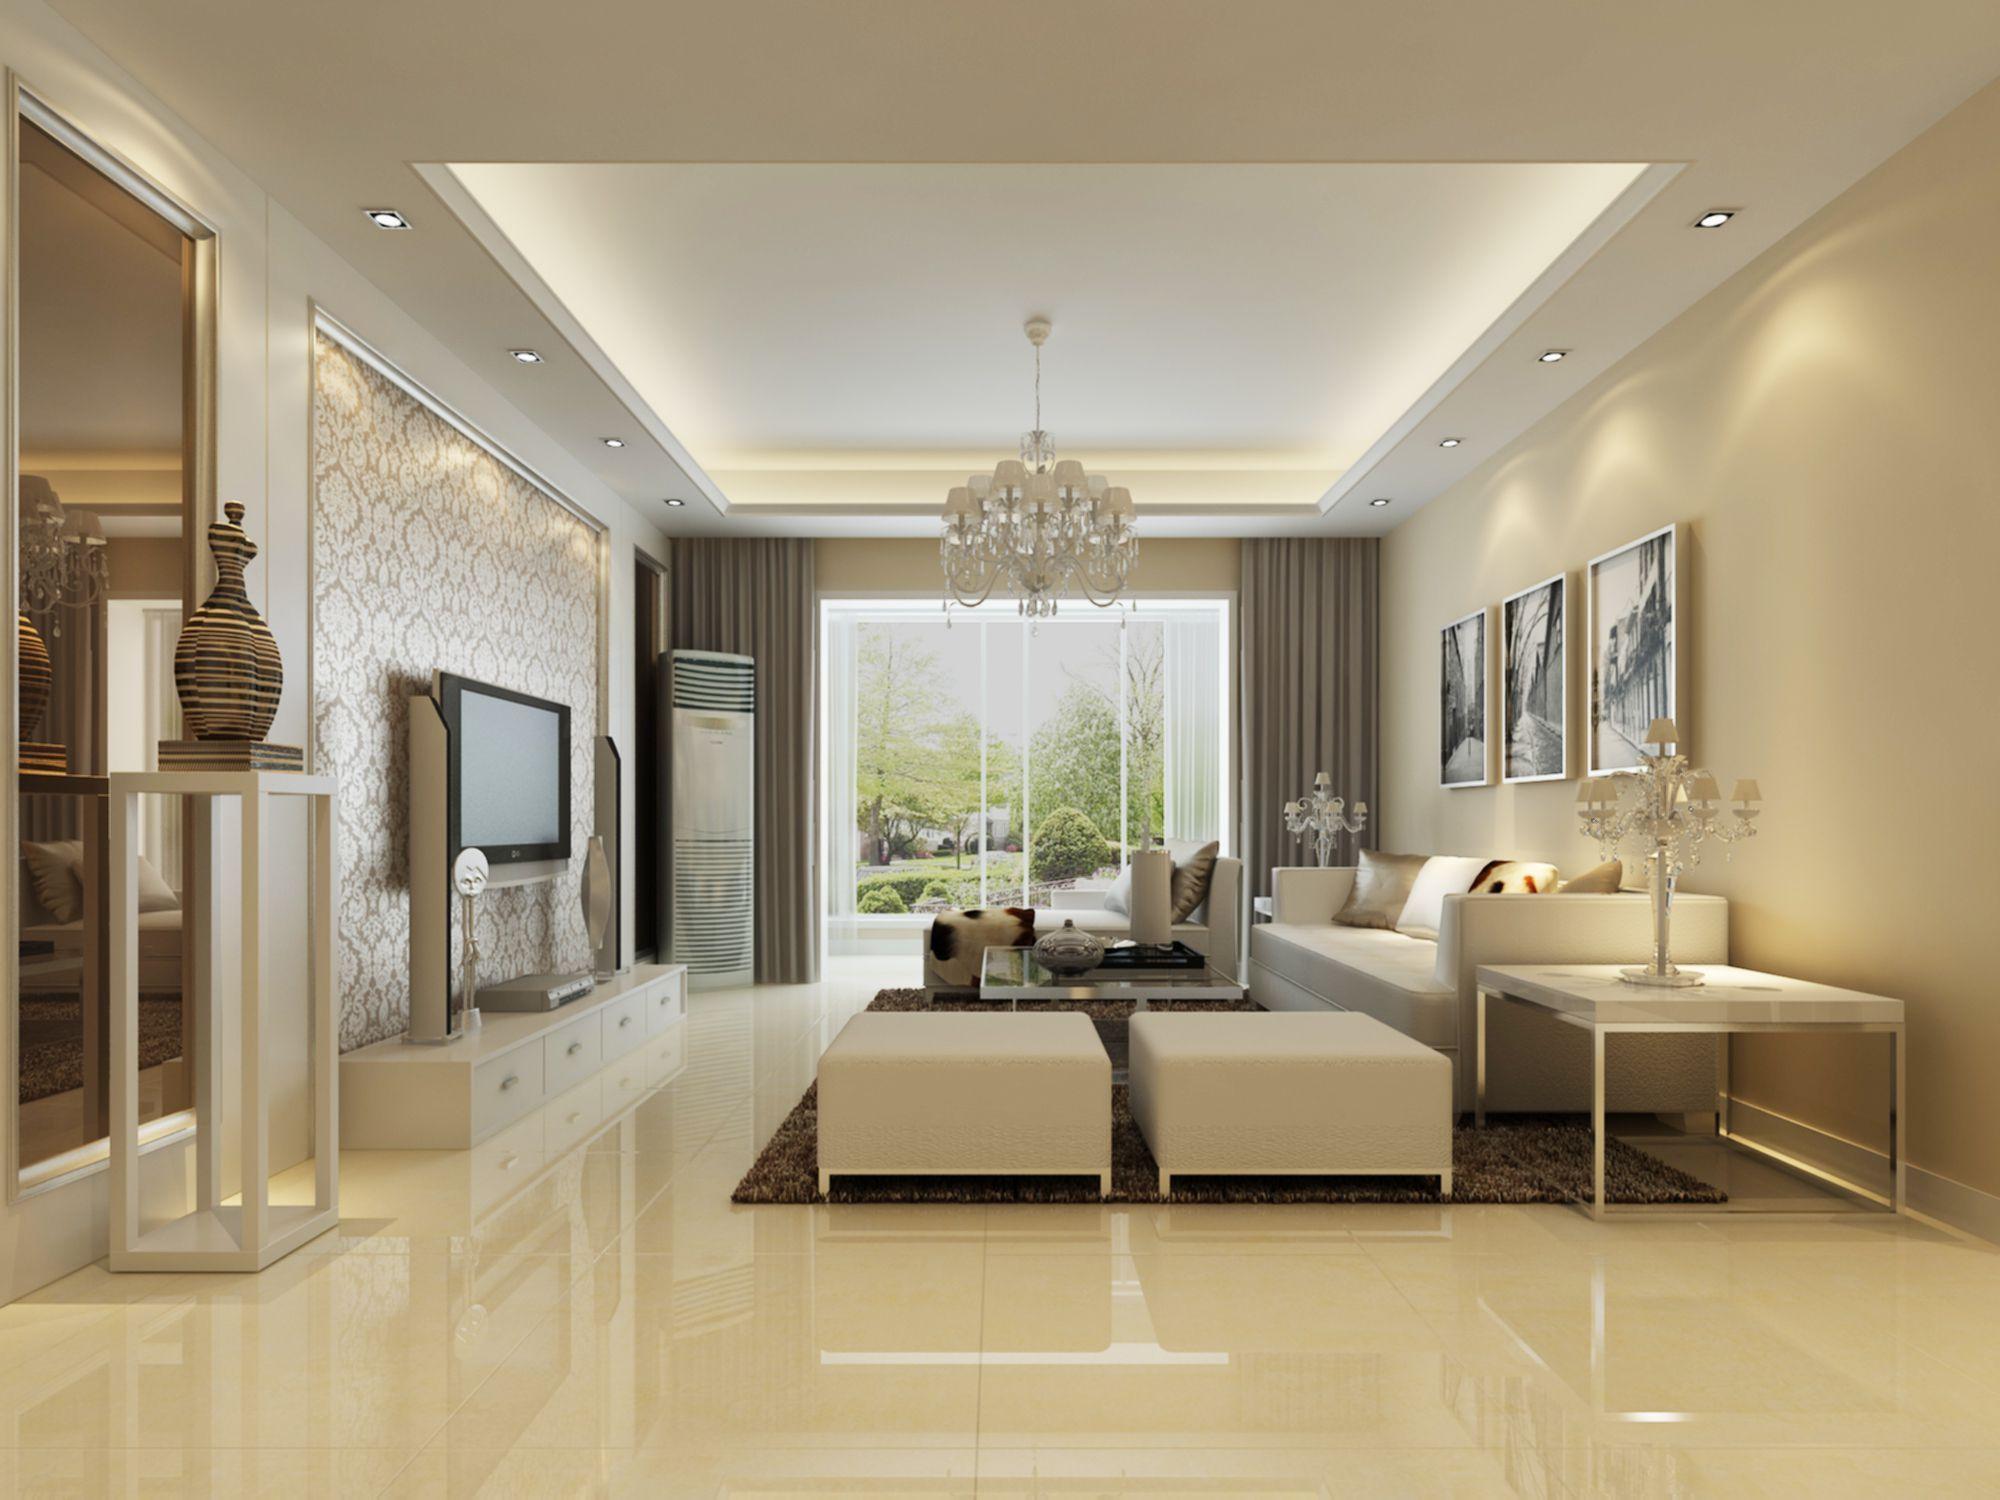 prodigious useful tips contemporary false ceiling pendant lights